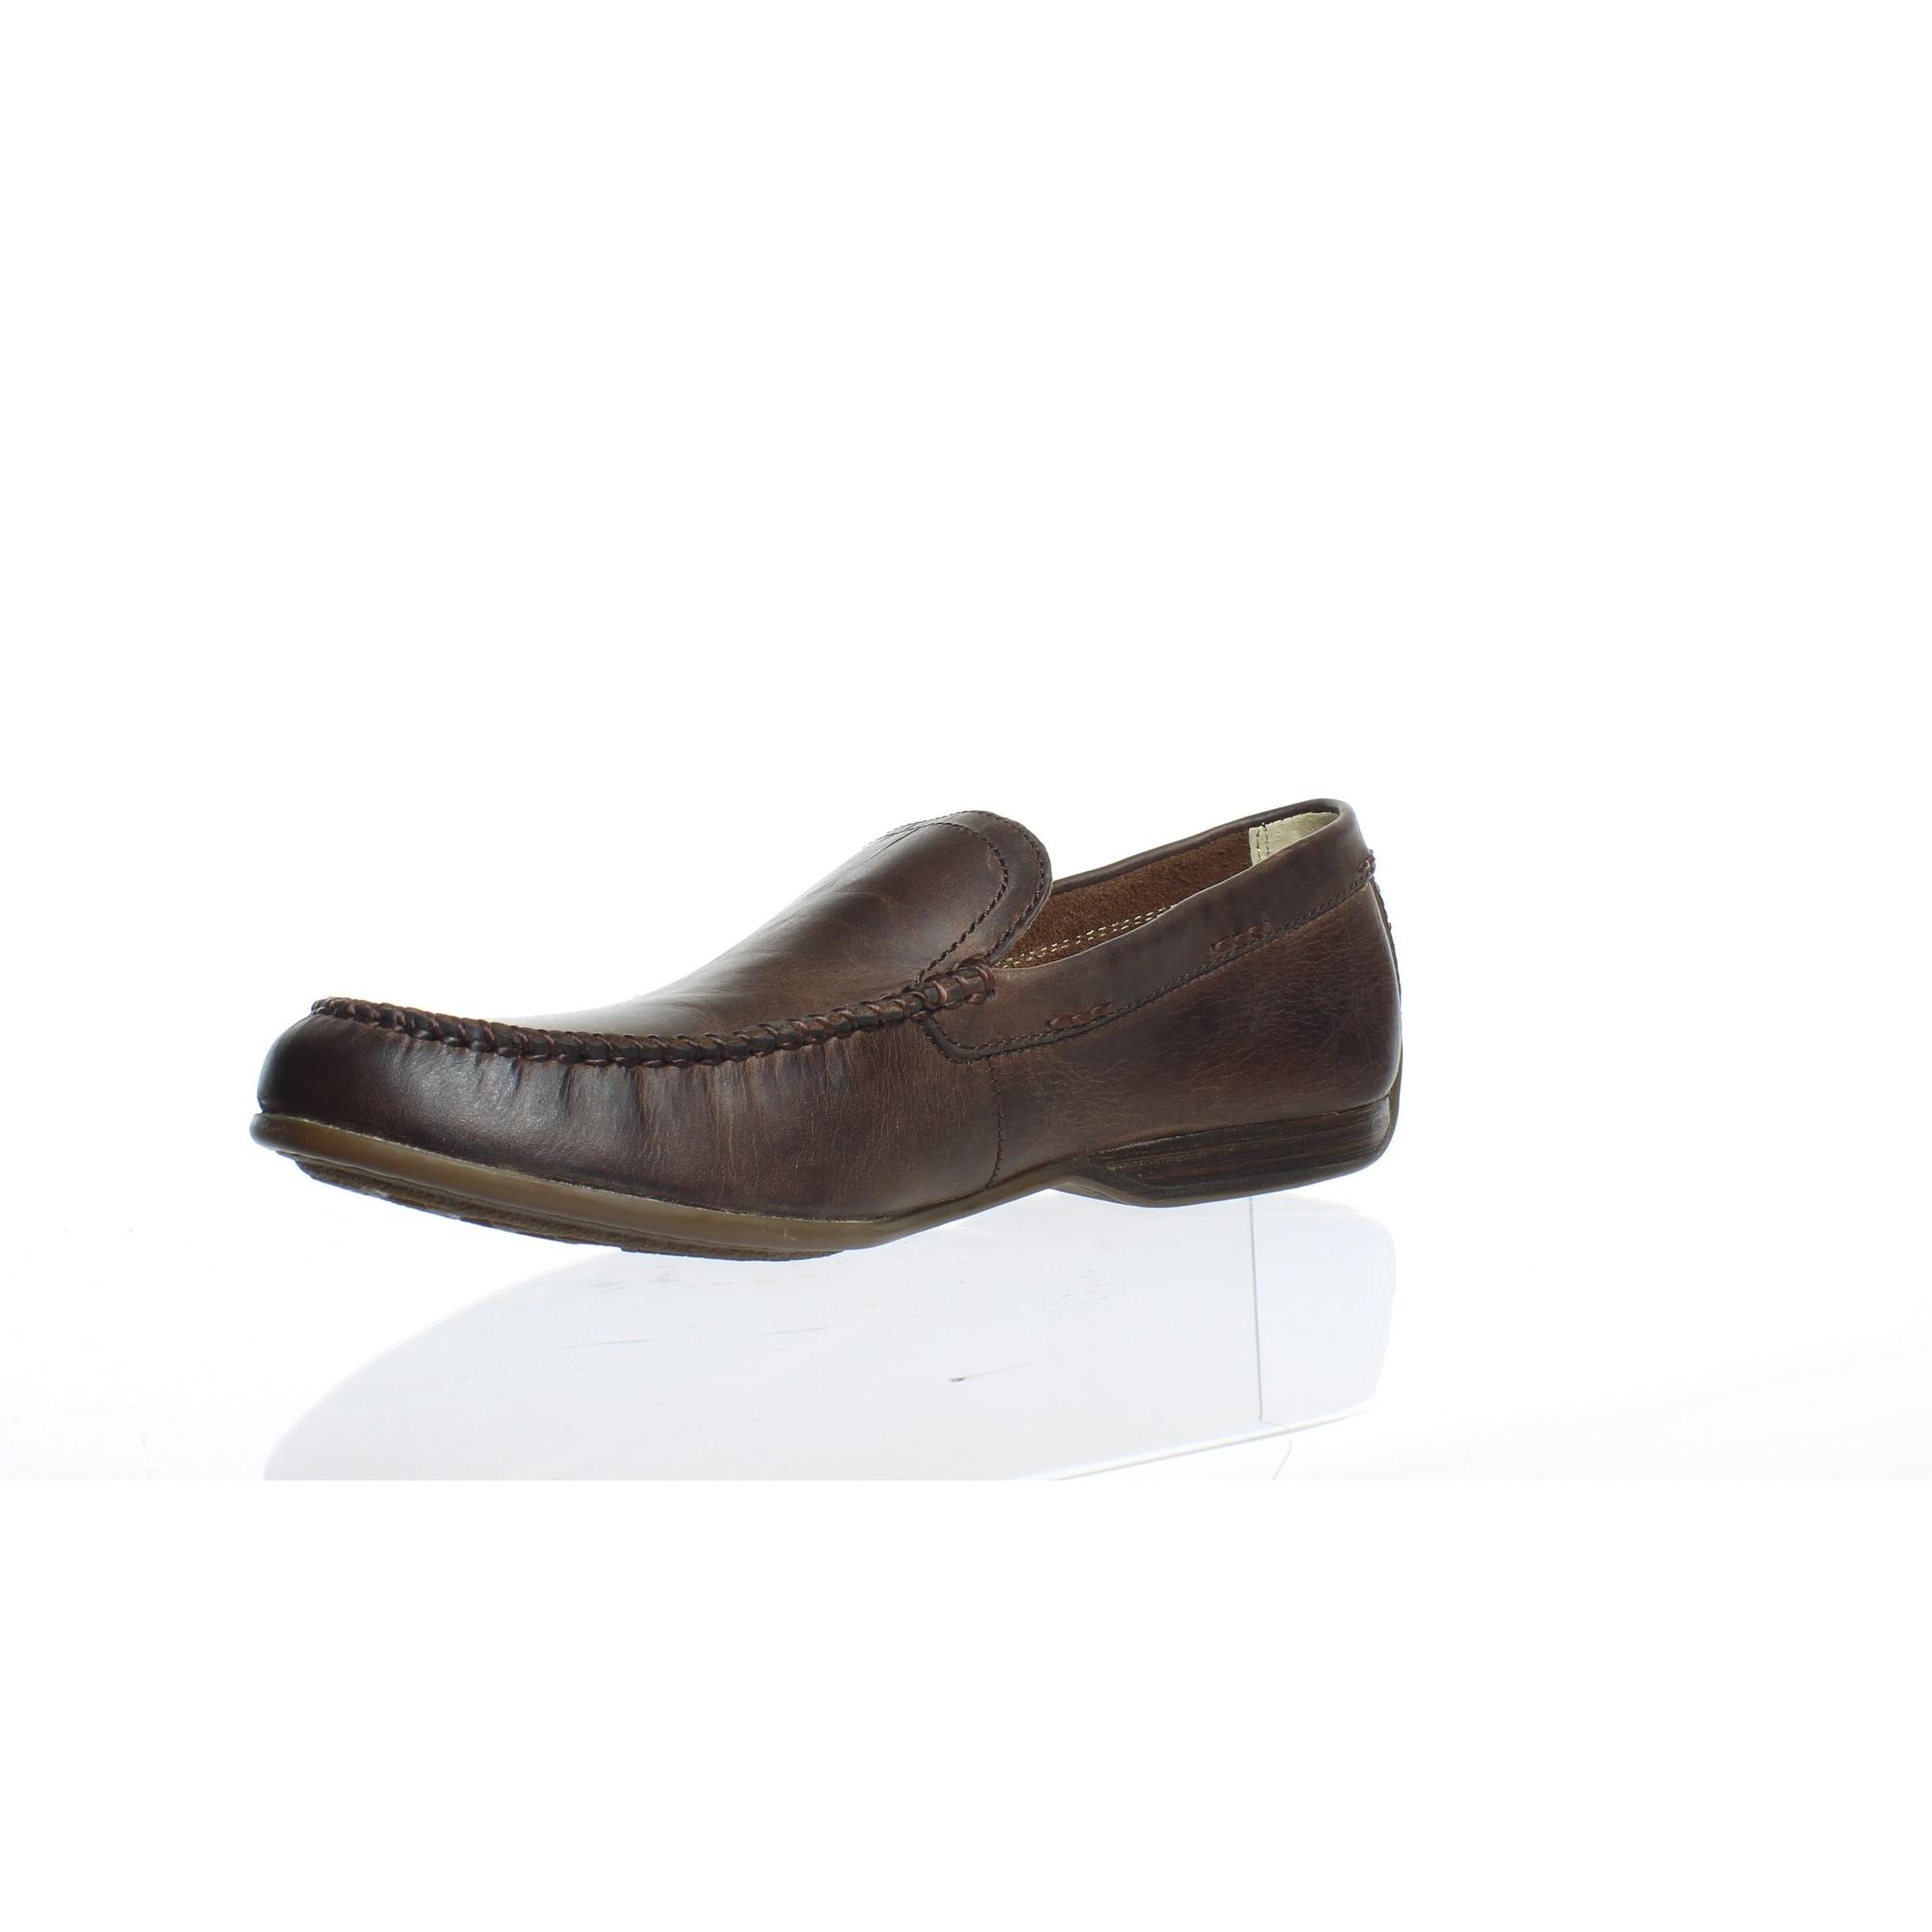 Frye Allen Venetian 85228 Mens Brown Nubuck Leather Casual Slip On Loafers Shoes